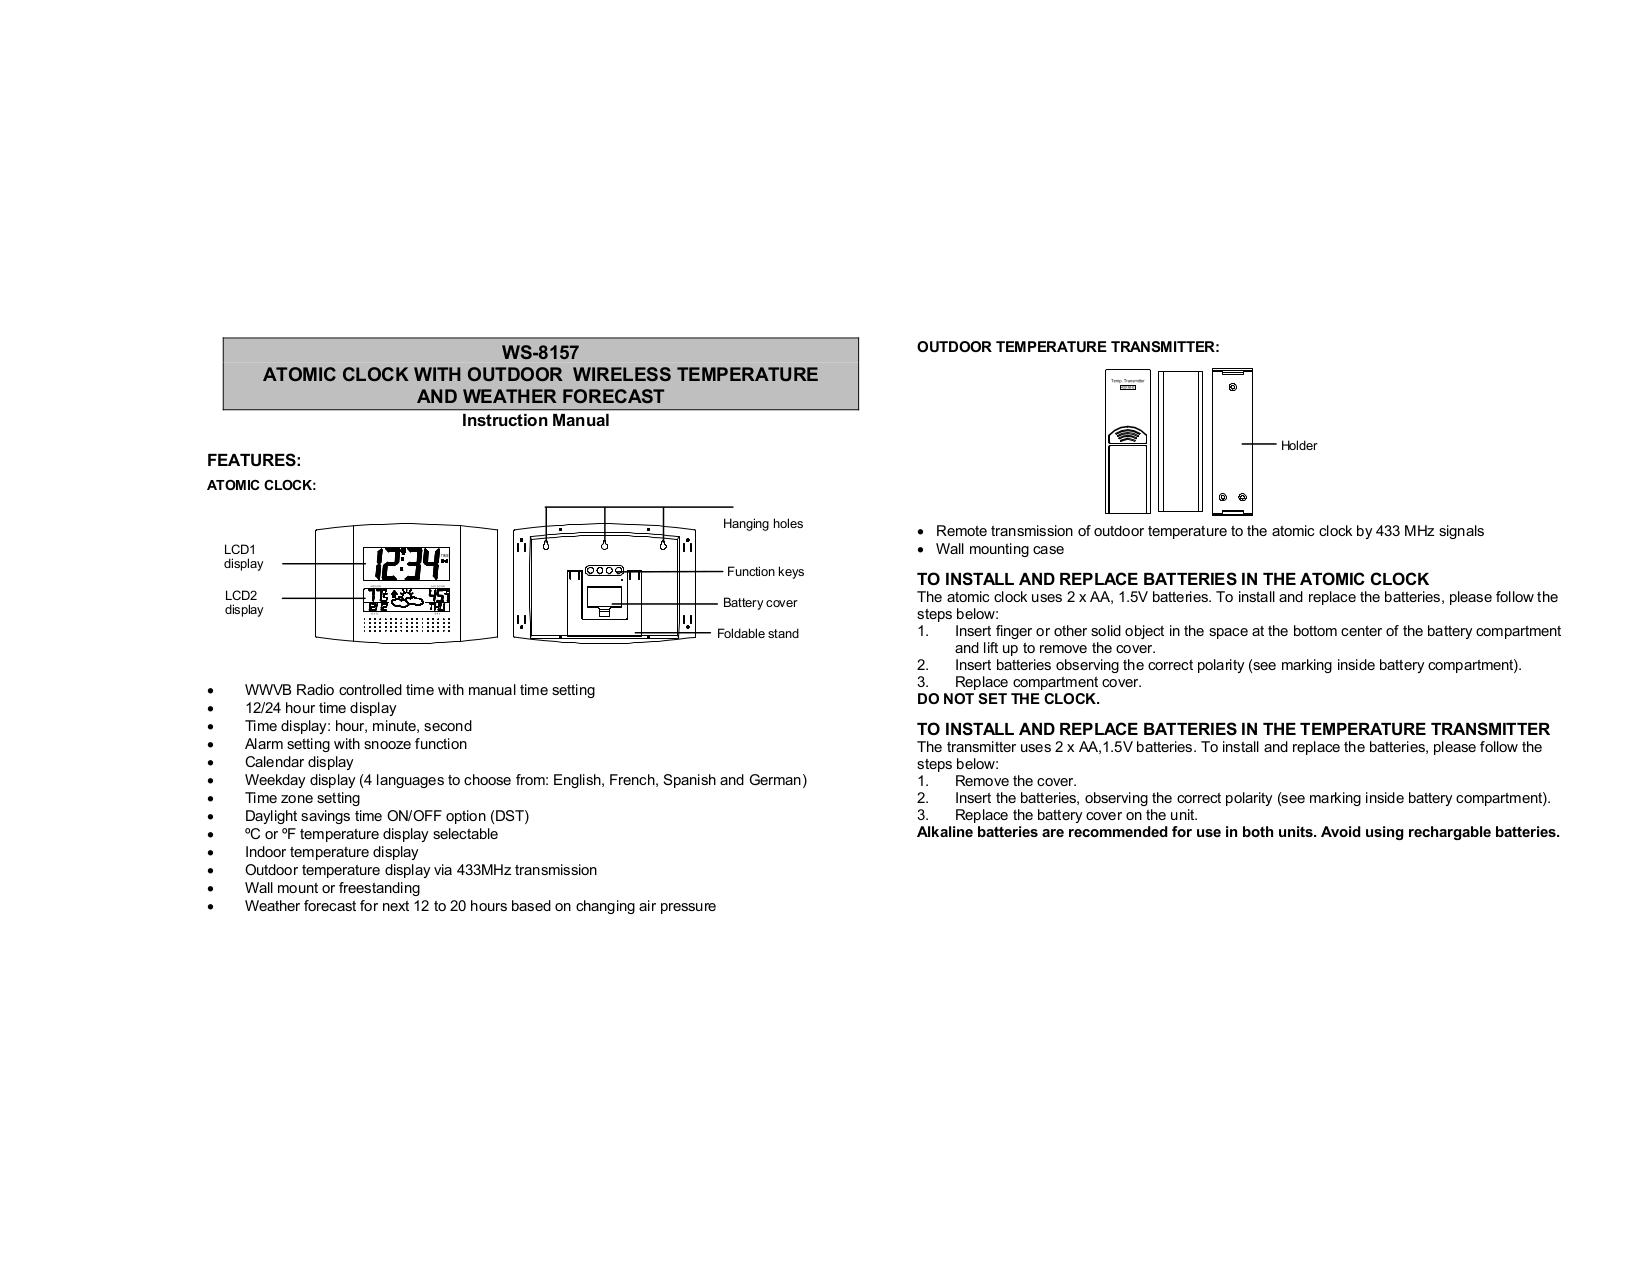 pdf for Lacrosse Other WS-8157U-A Digital Atomic Clock manual